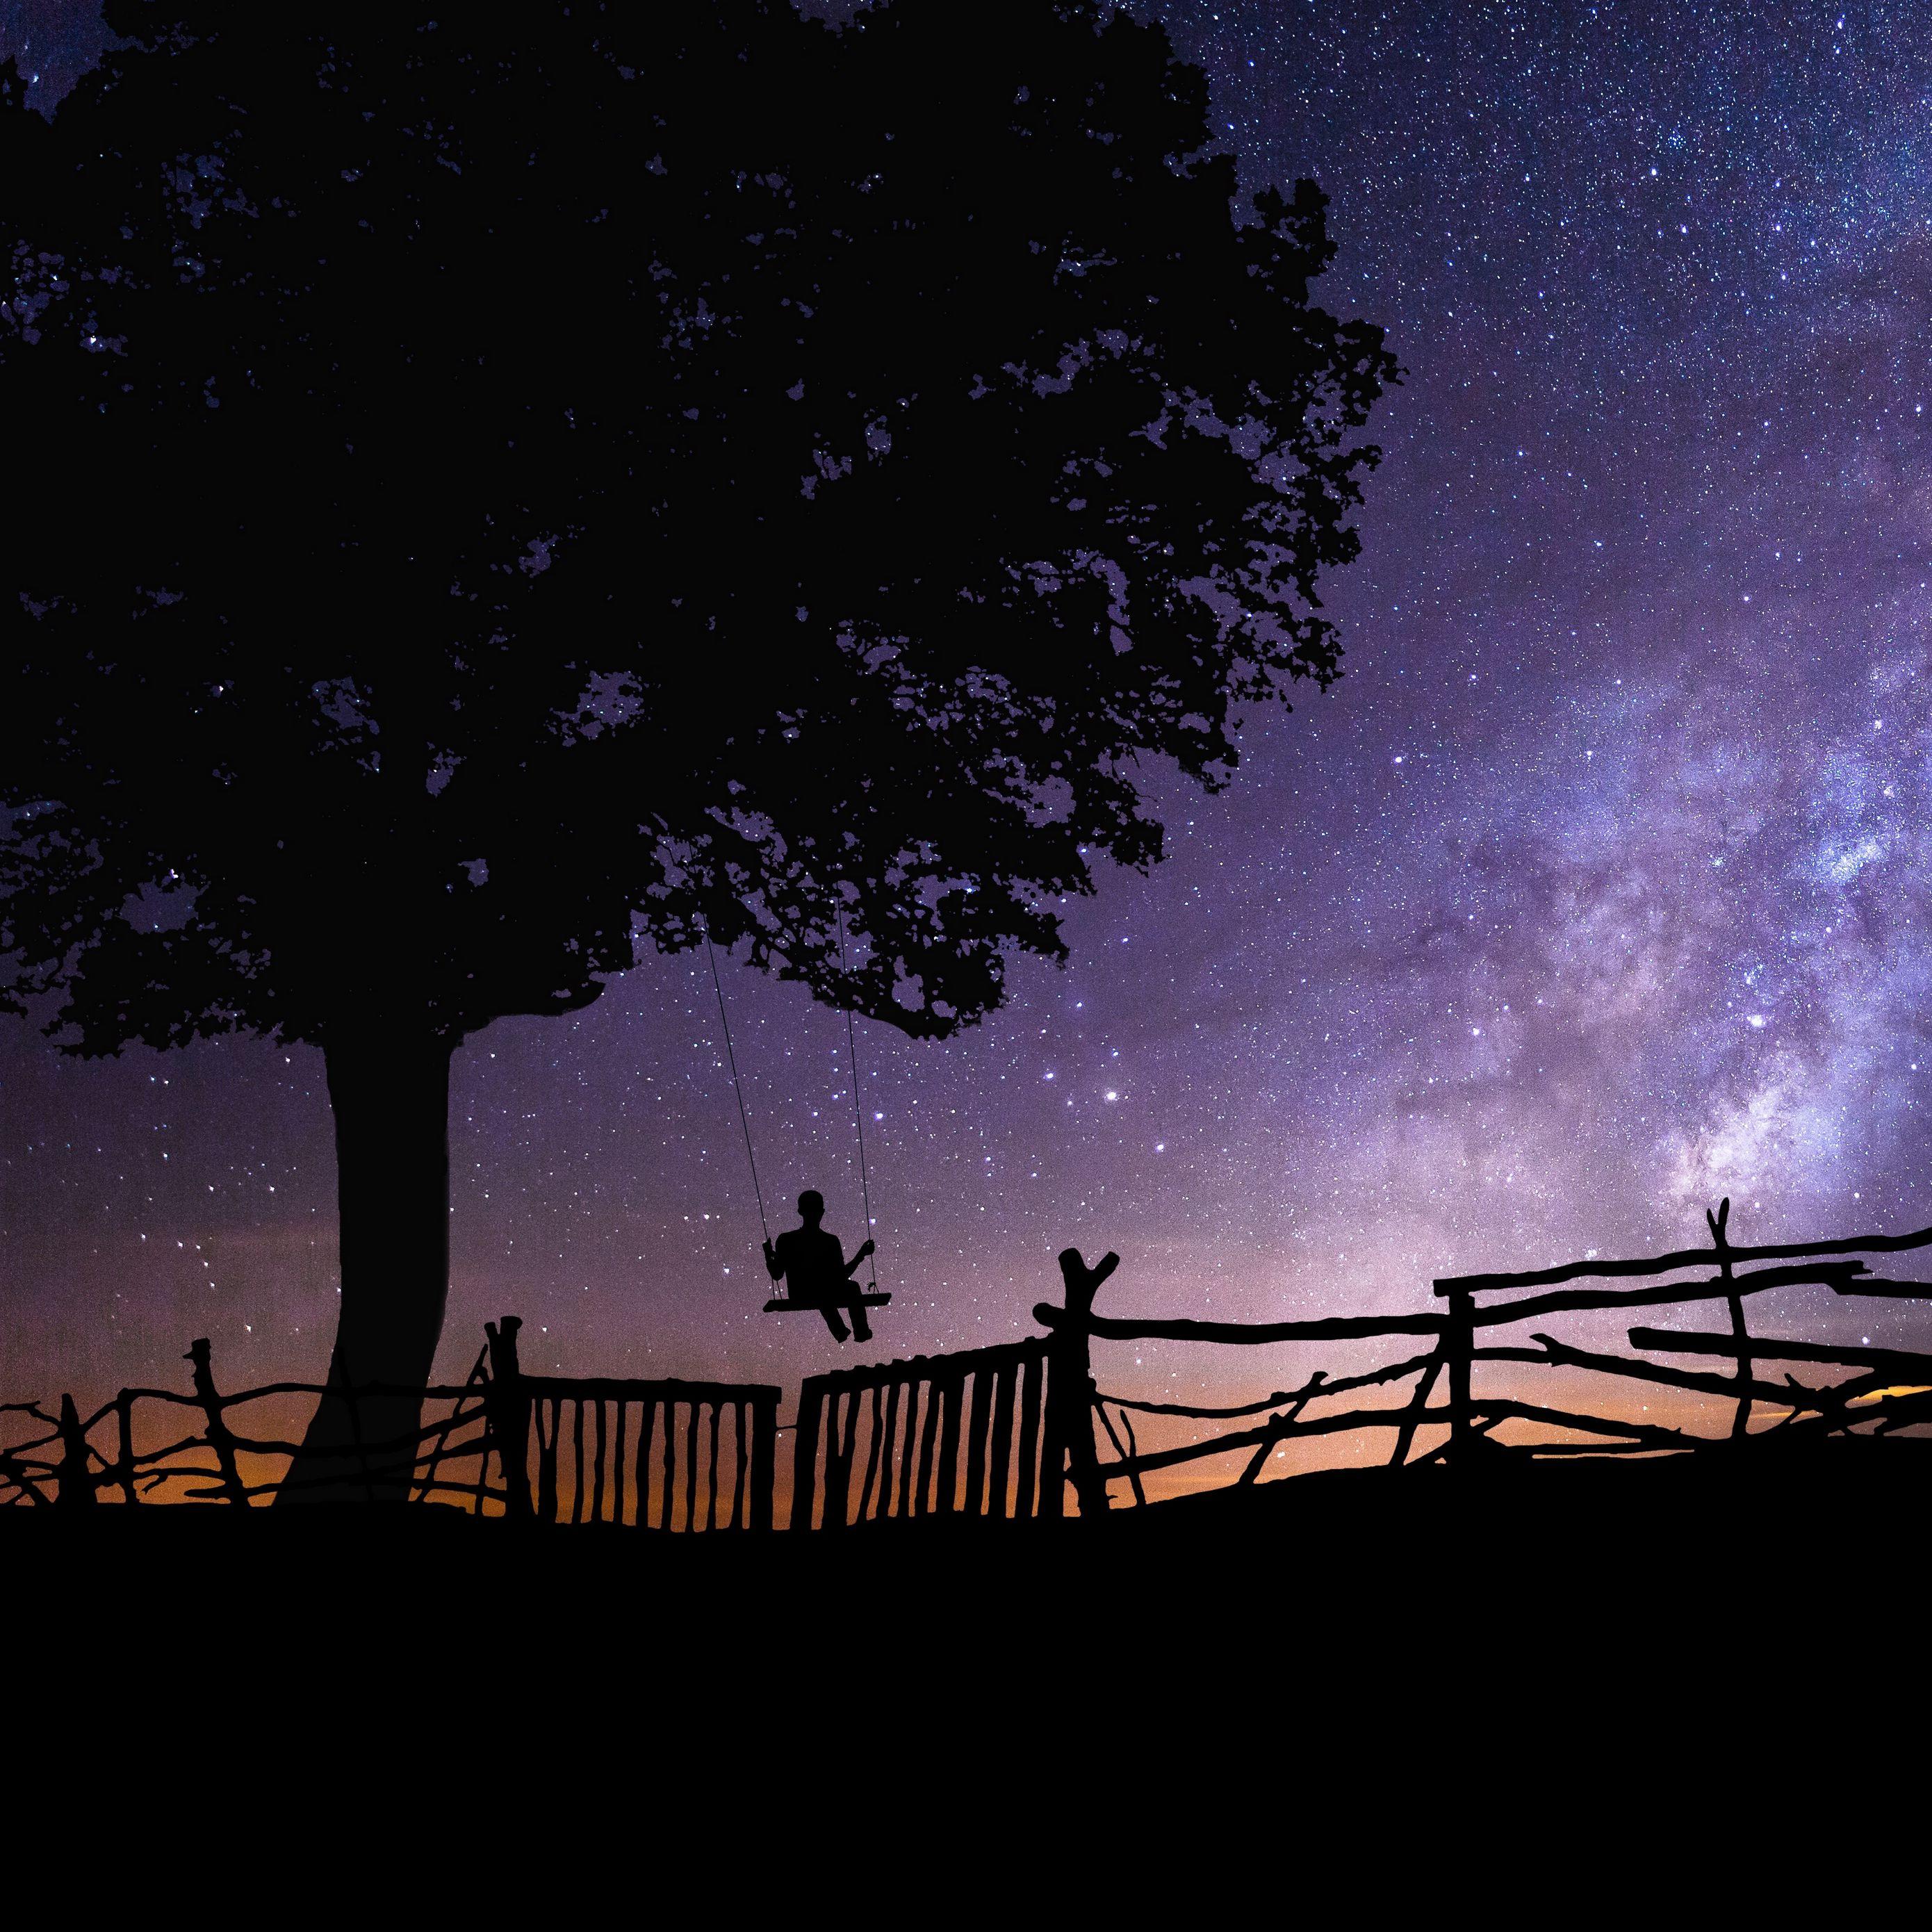 2780x2780 Обои звездное небо, силуэт, качели, дерево, ночь